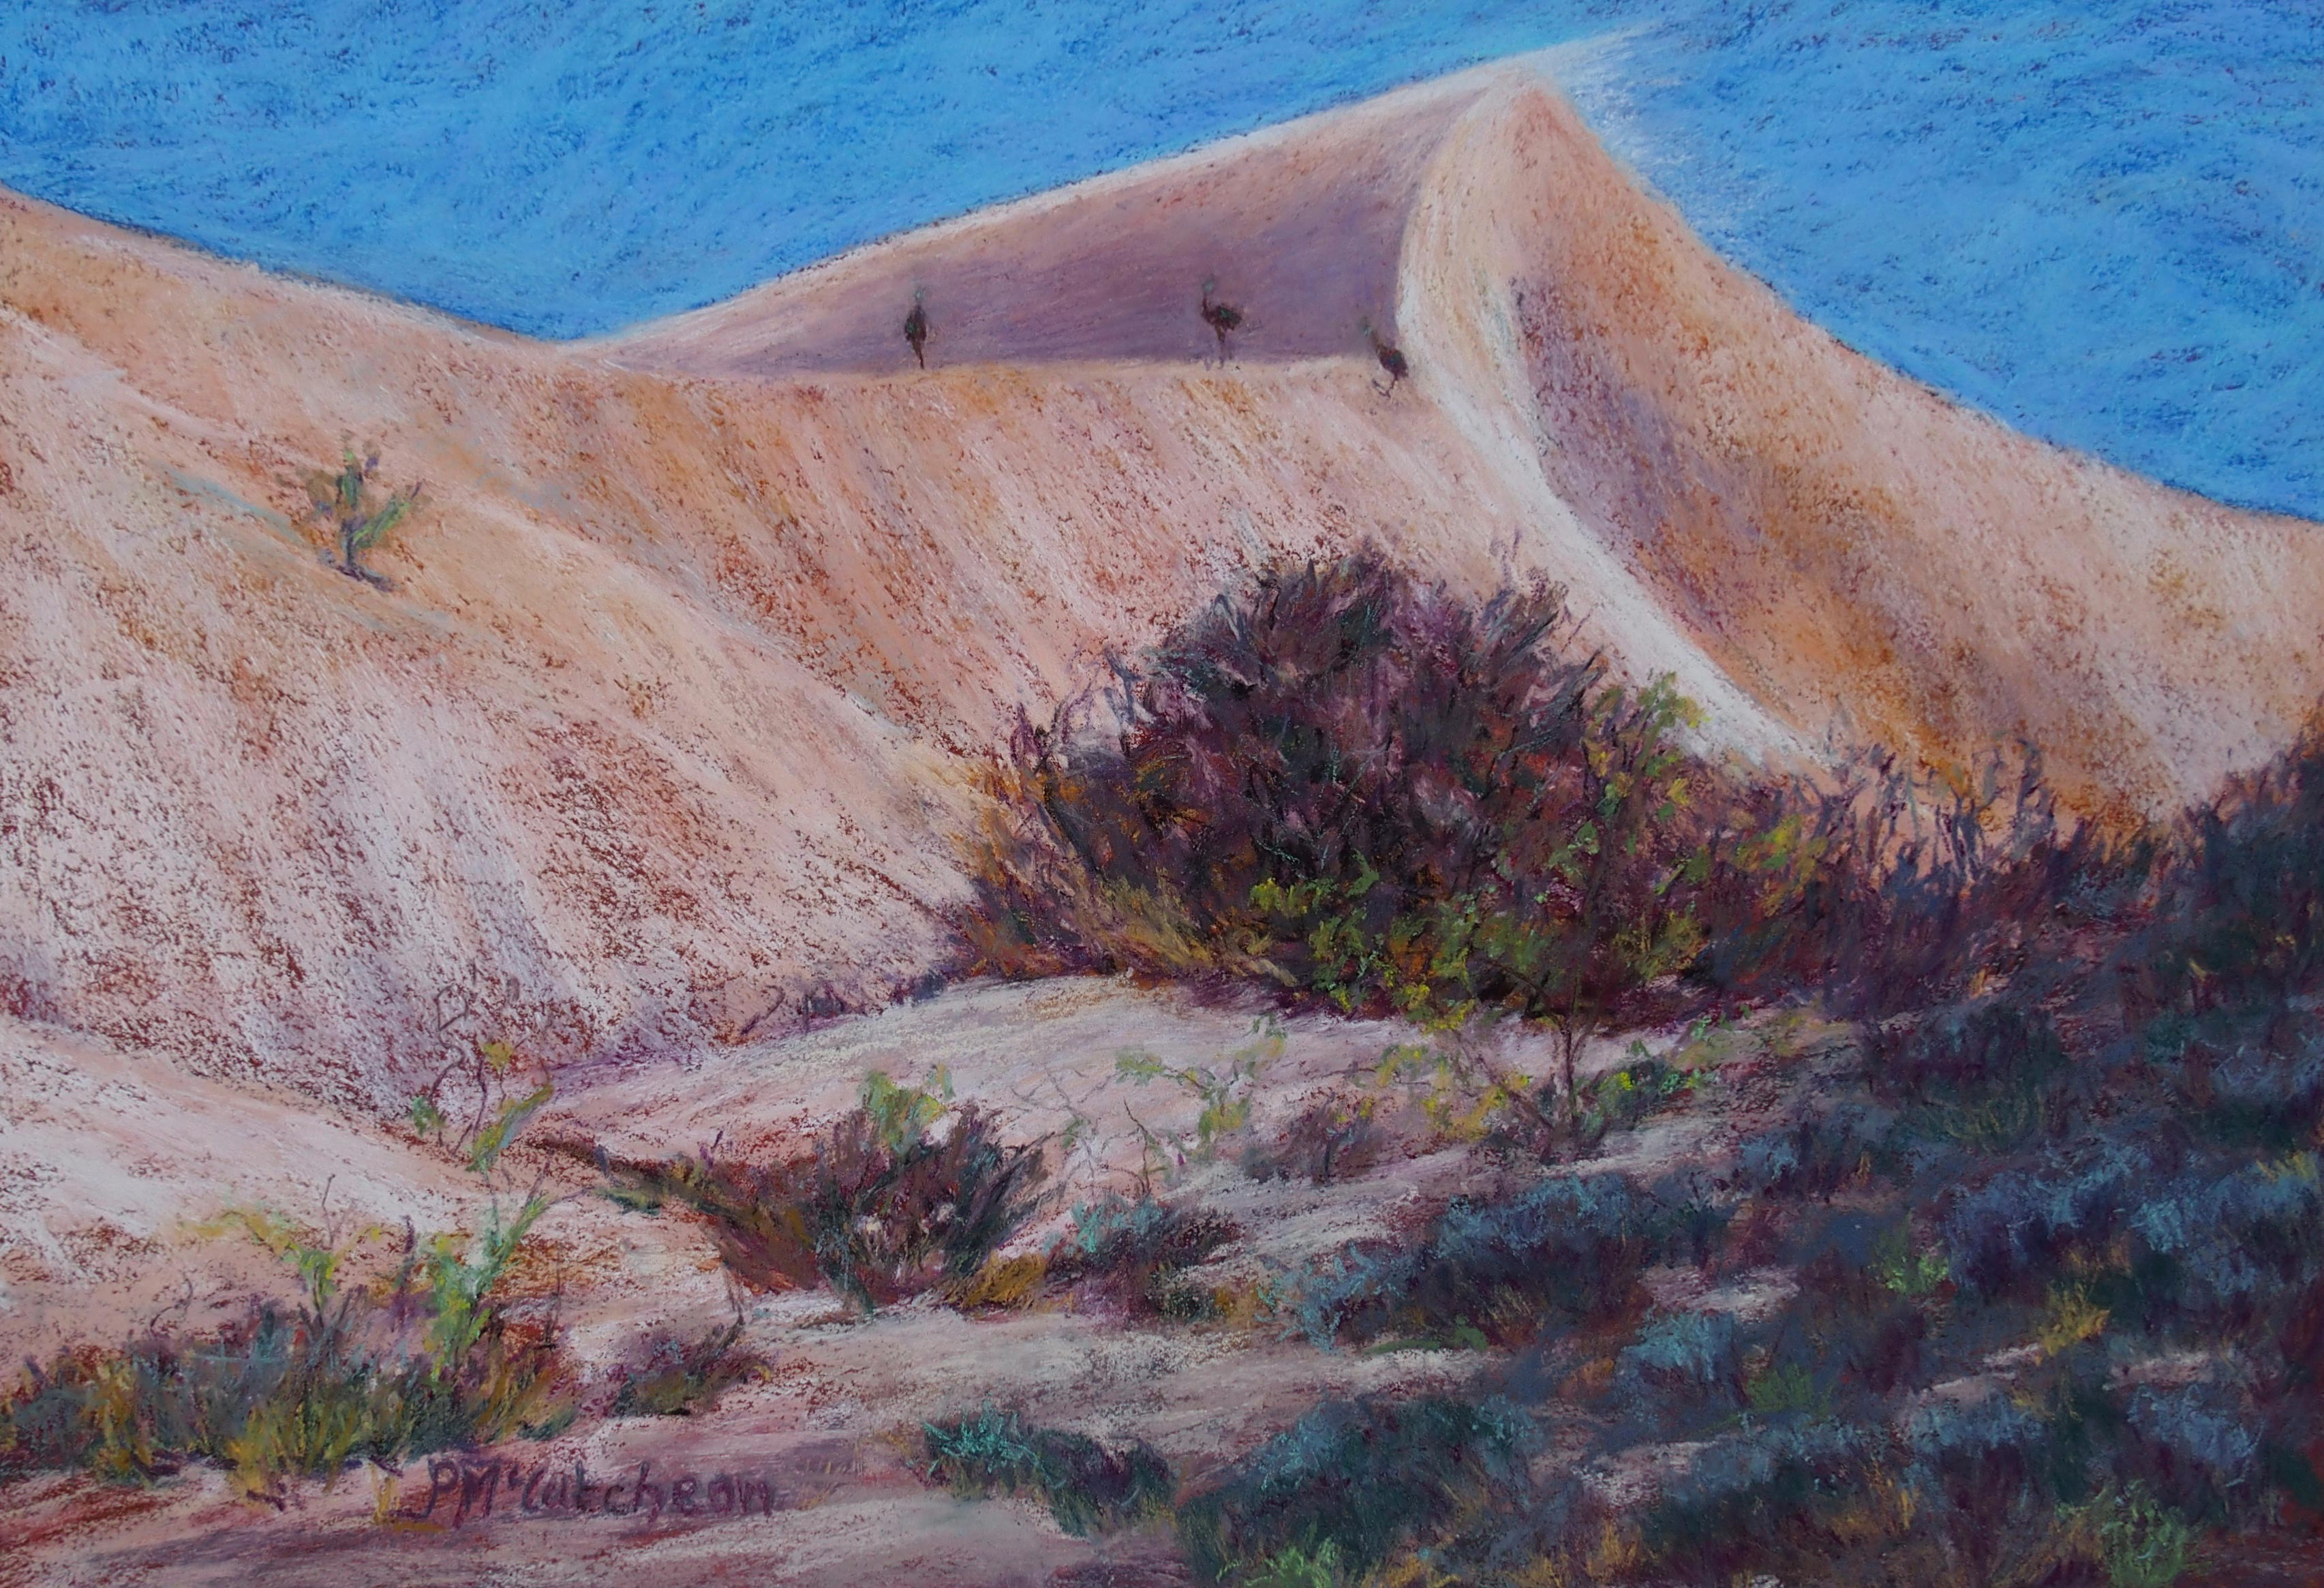 Emus cross Mungo Mungo Sand dunes